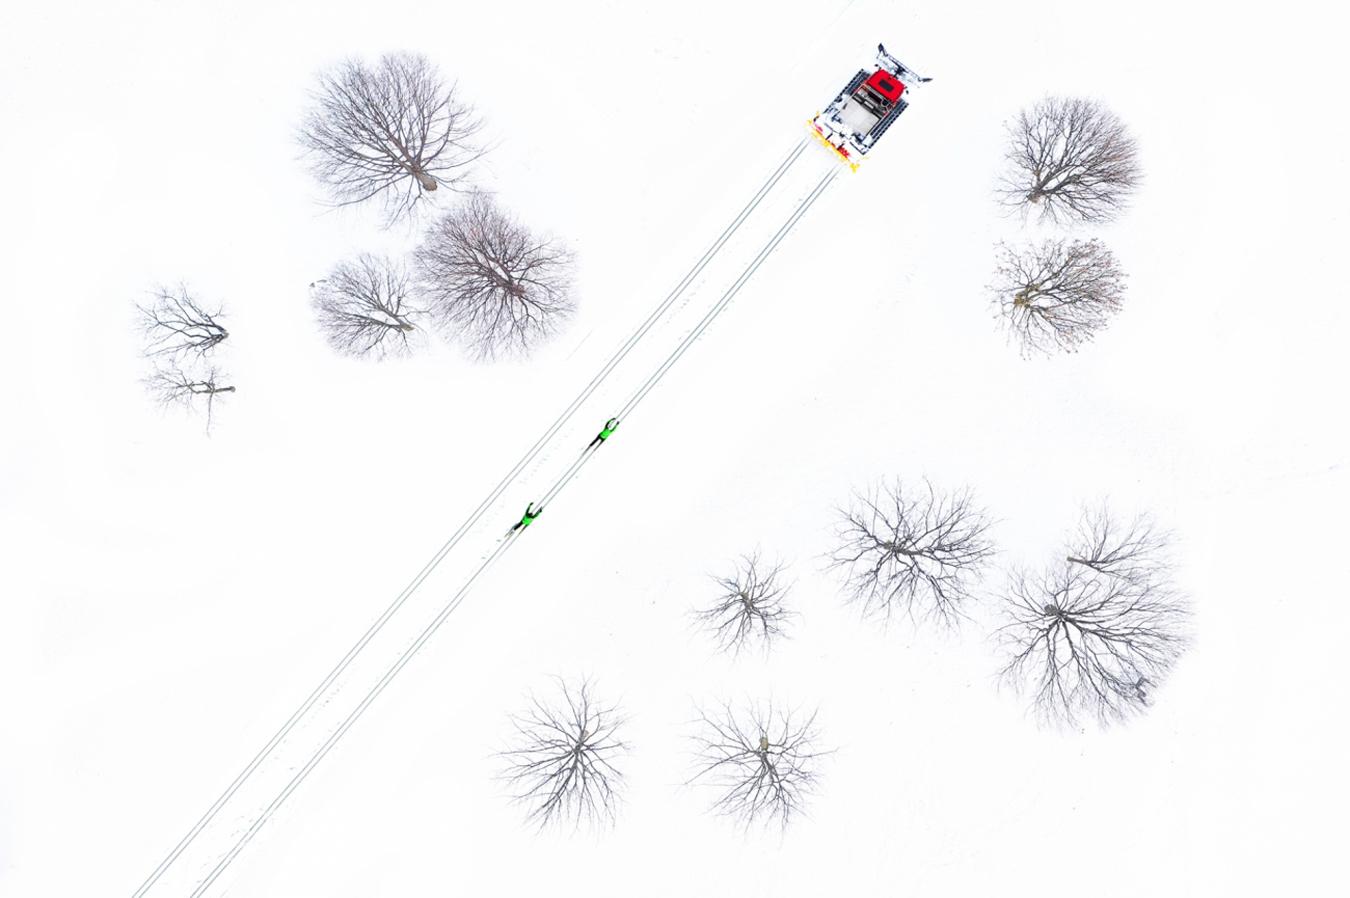 Fotos dron nieve